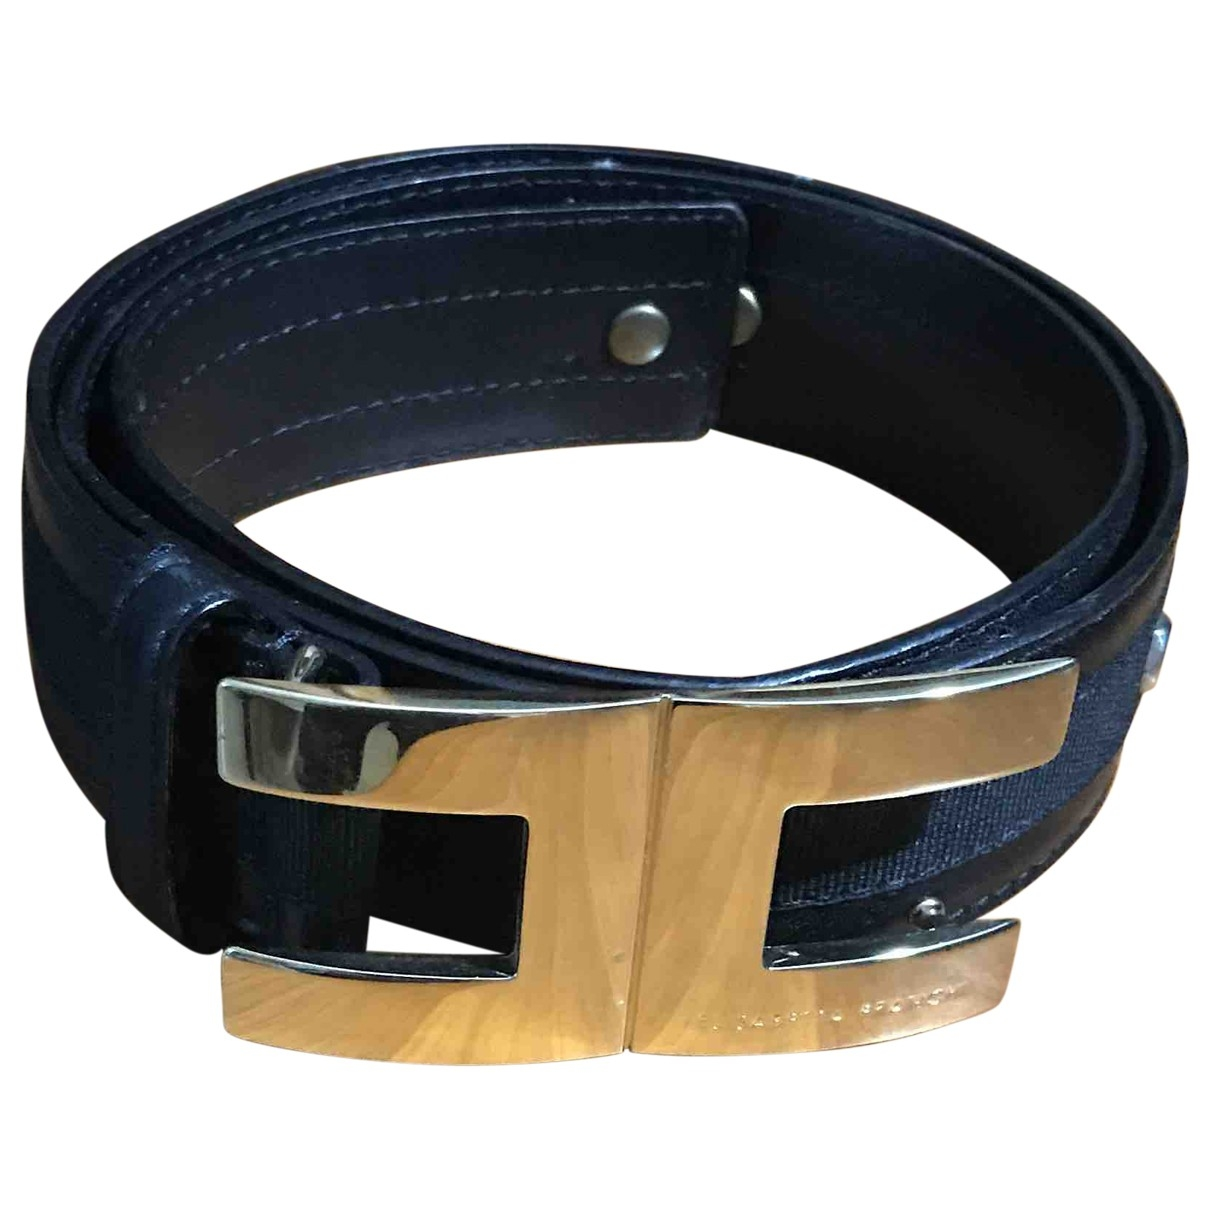 Elisabetta Franchi \N Leather belt for Women M International